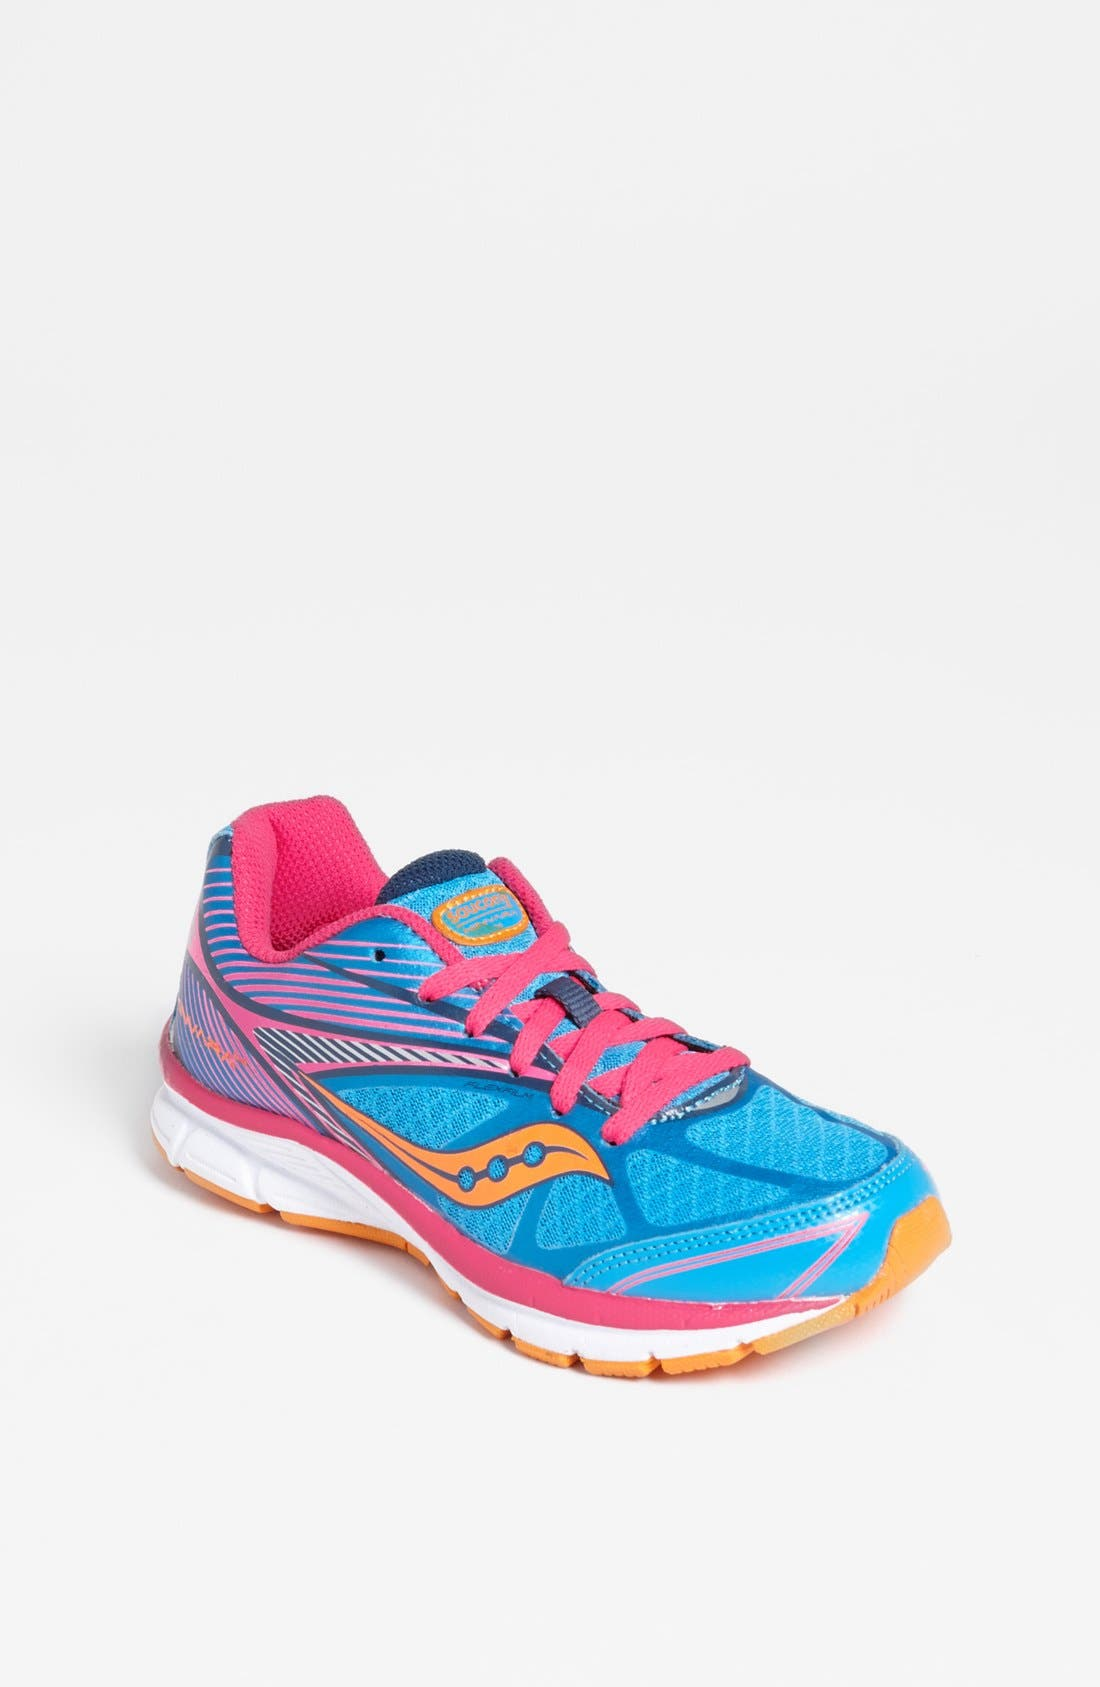 Main Image - Saucony 'Kinvara' Athletic Shoe (Toddler, Little Kid & Big Kid)